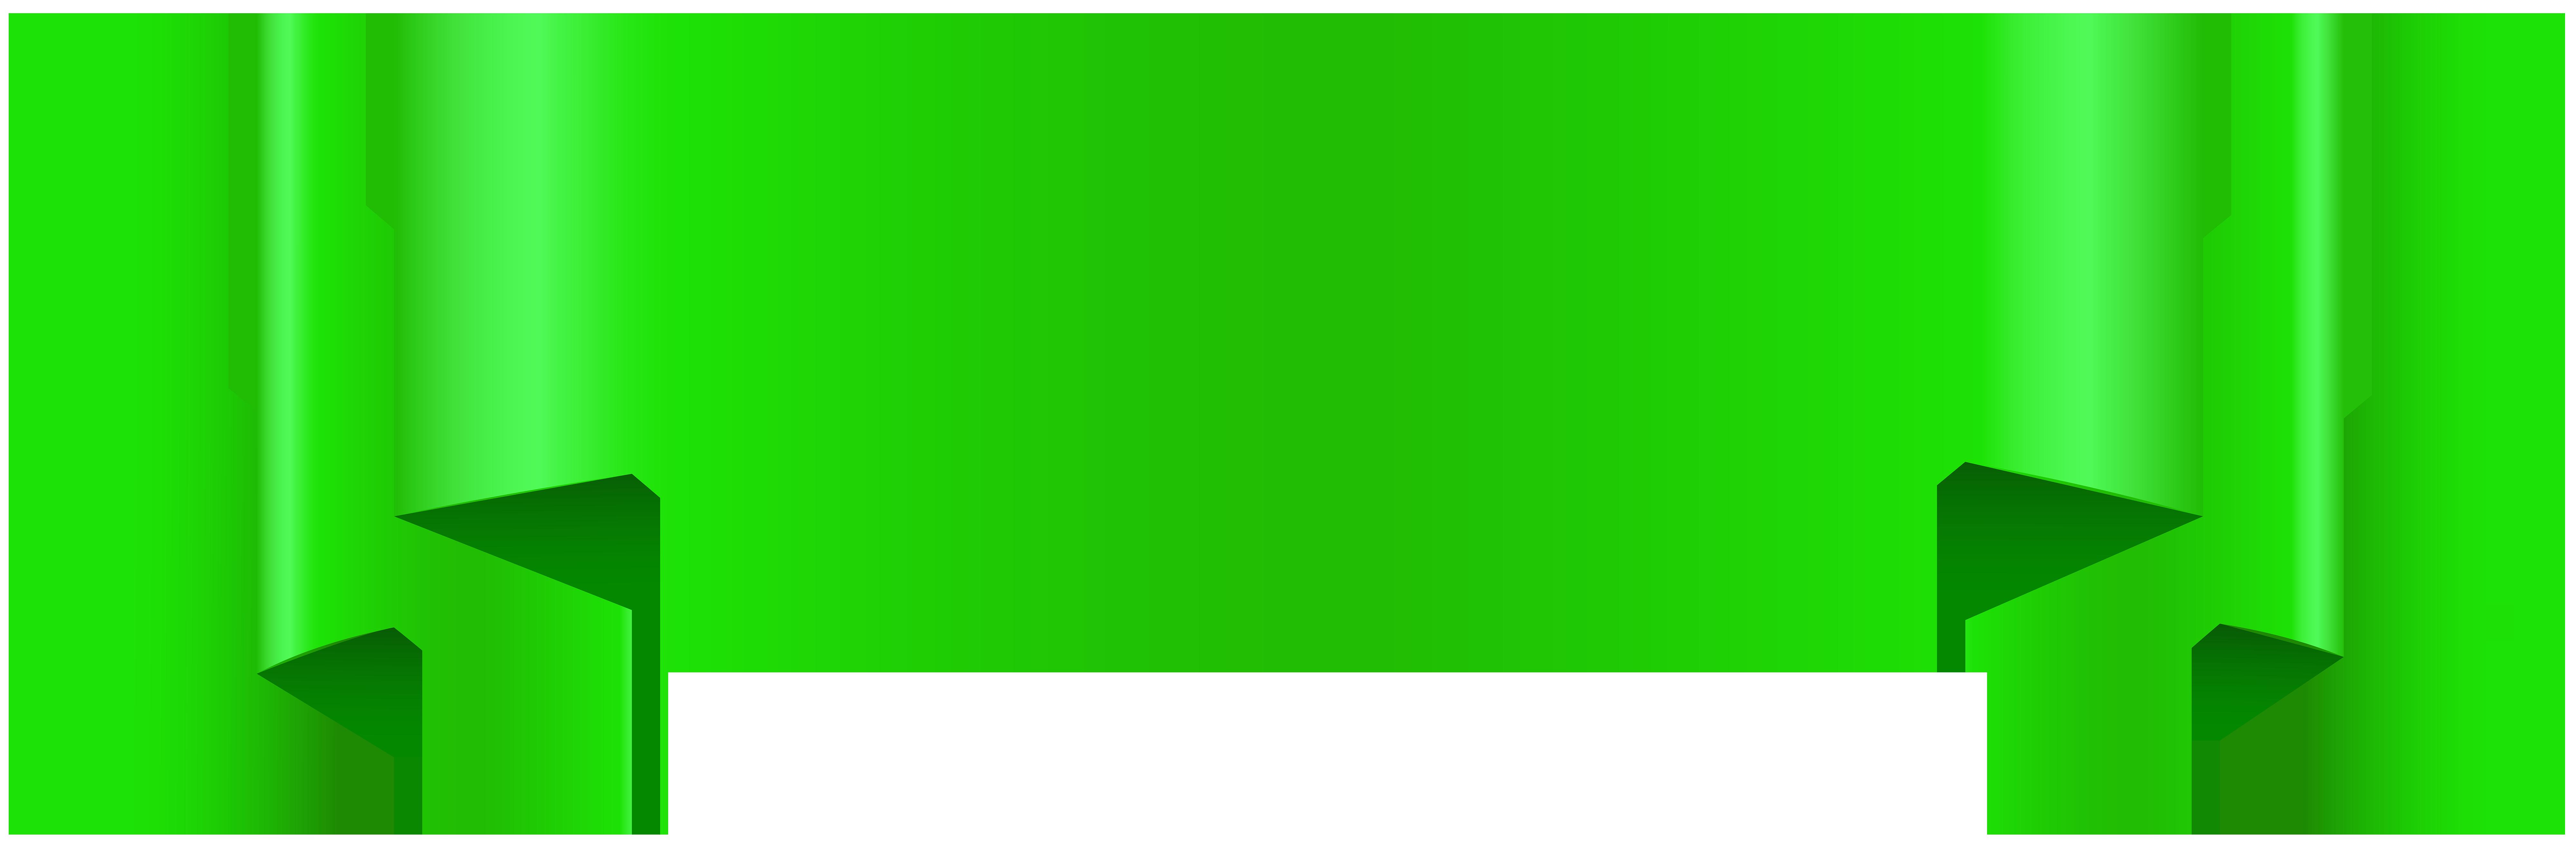 Clipart green clipart transparent download Green Banner Transparent Clip Art | Gallery Yopriceville - High ... clipart transparent download